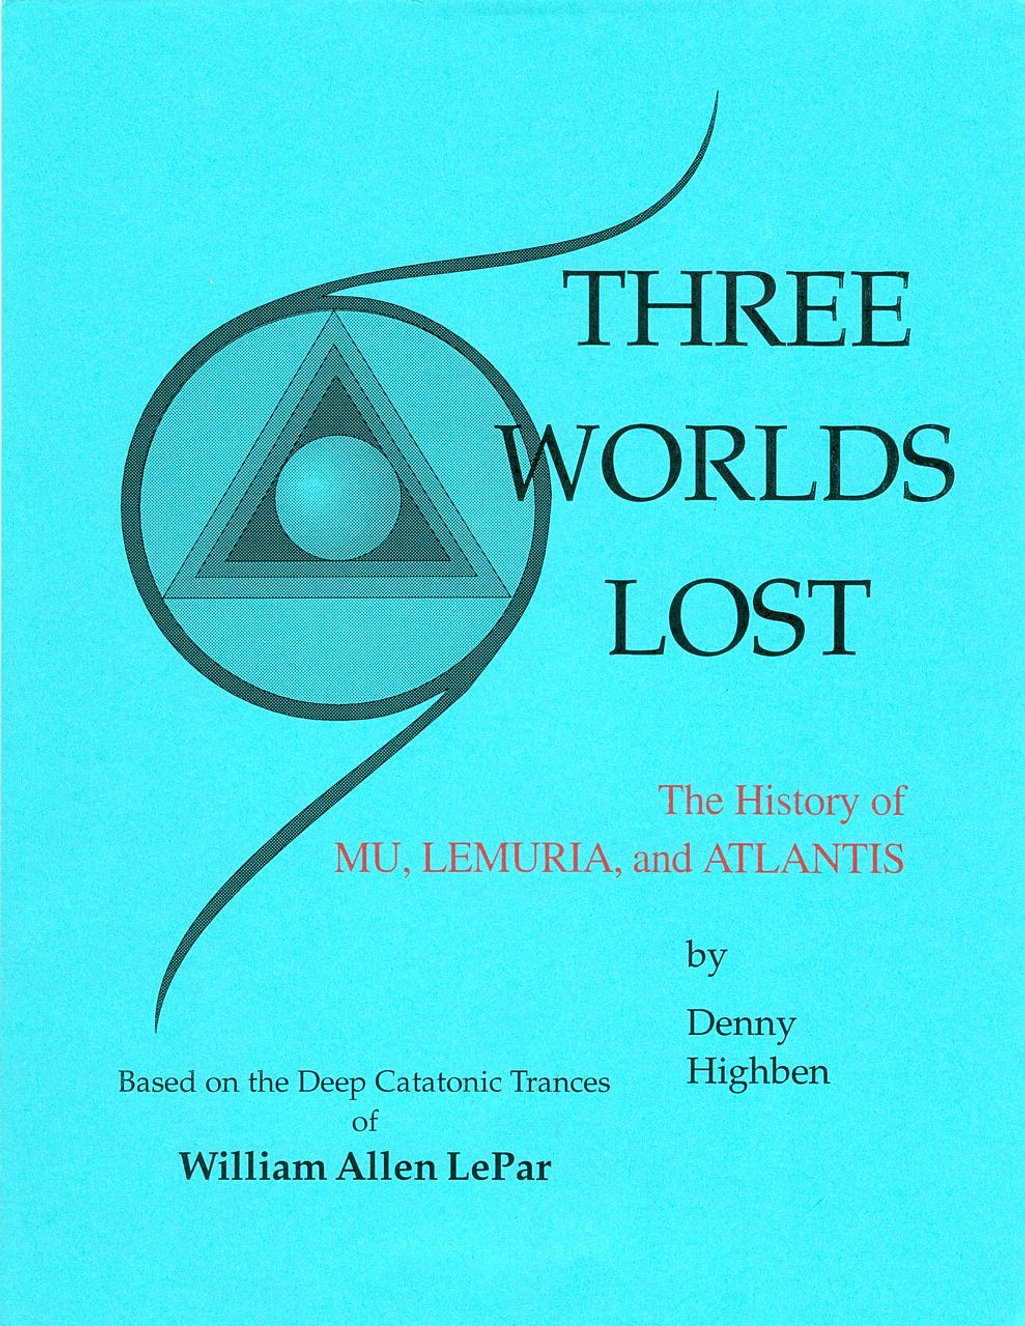 Mu, Lemuria, Atlantis-3 Worlds Lost